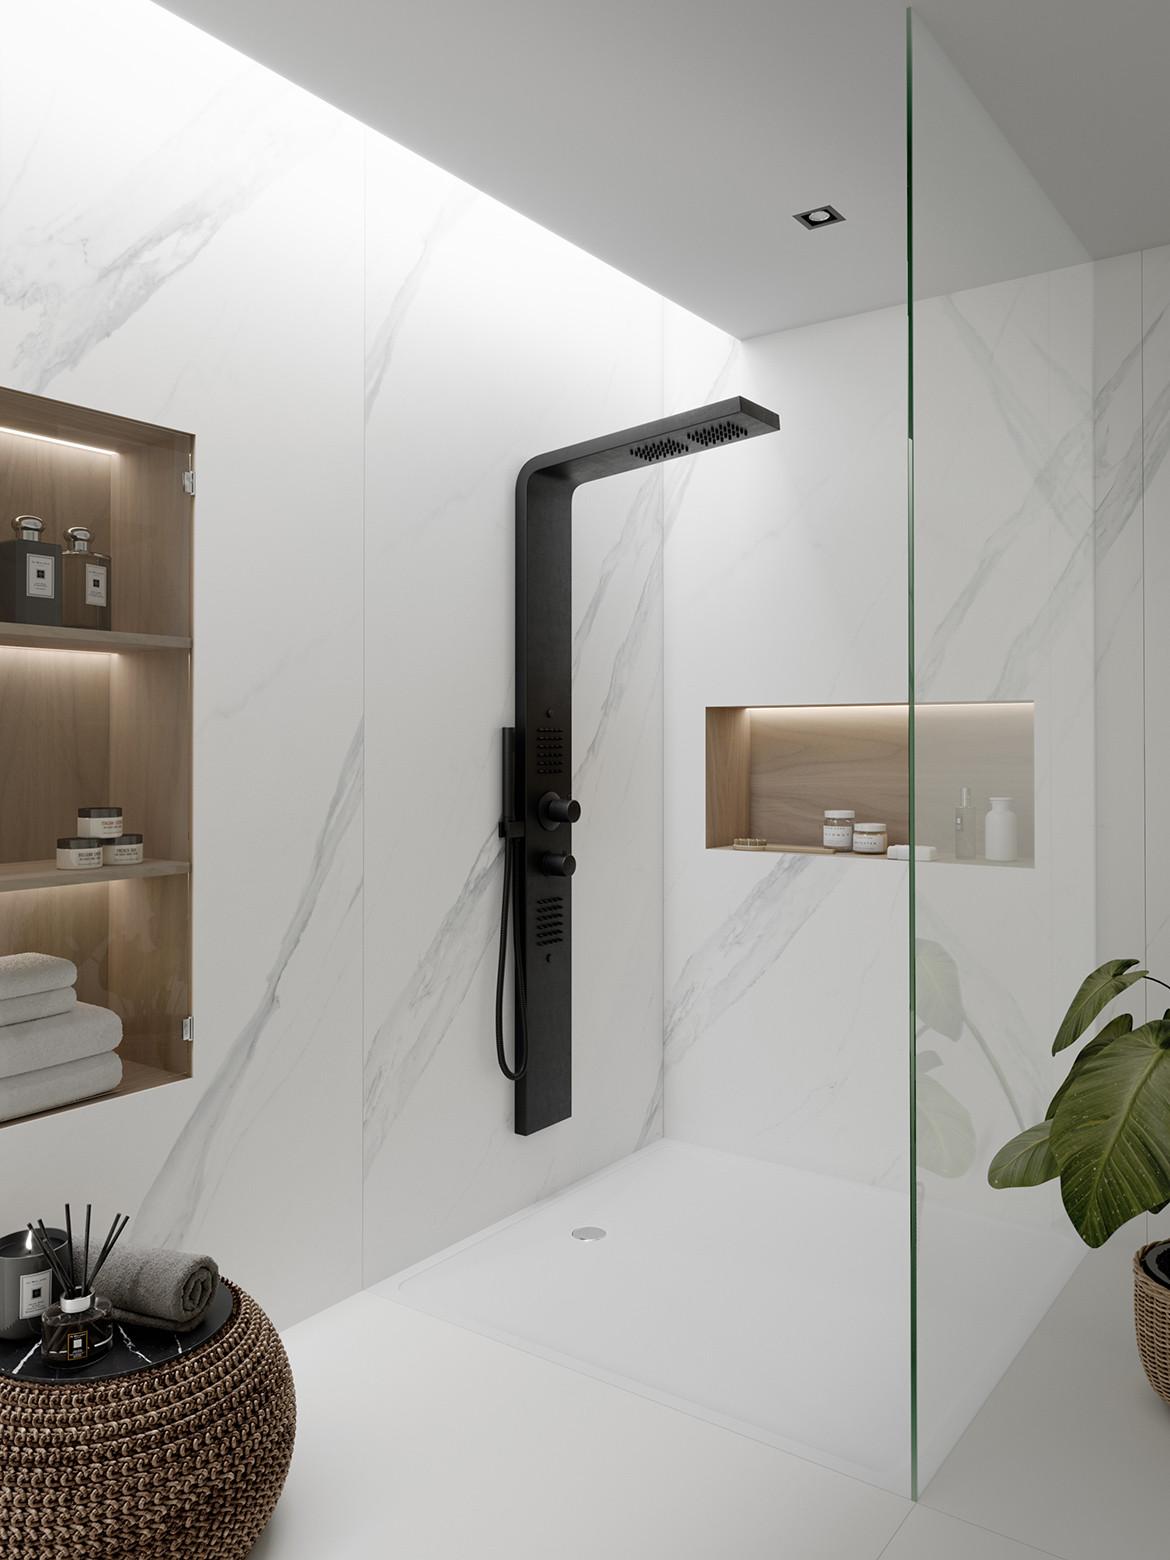 Dekton Kelya Natural Collection dekton slim for a modern, minimalist aesthetic | habitus living